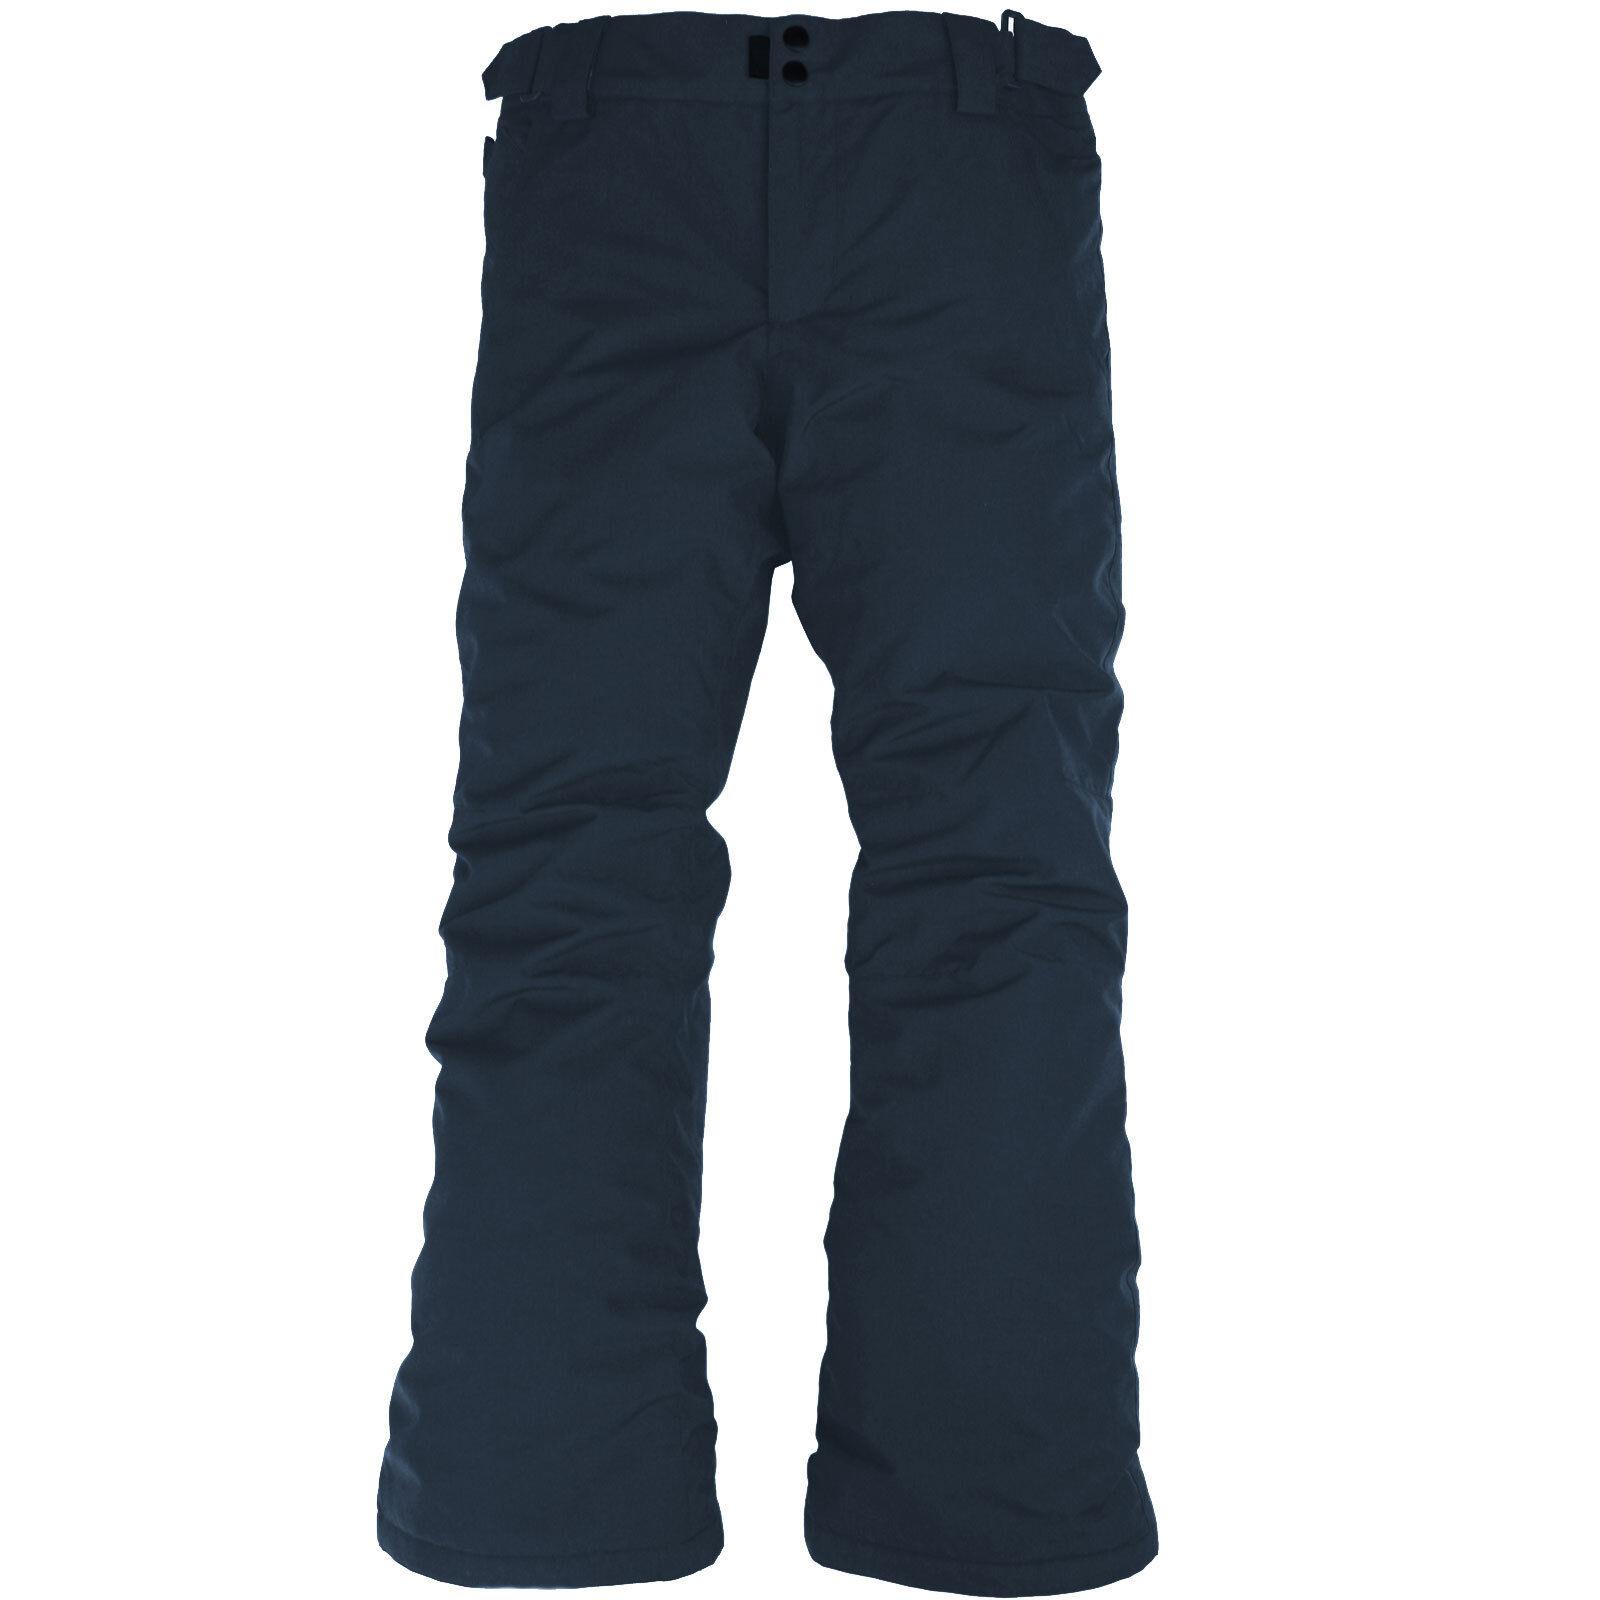 Ride Darth Youth Pant Kinder-Skihose Schneehose Winterhose Snowboardhose Hose